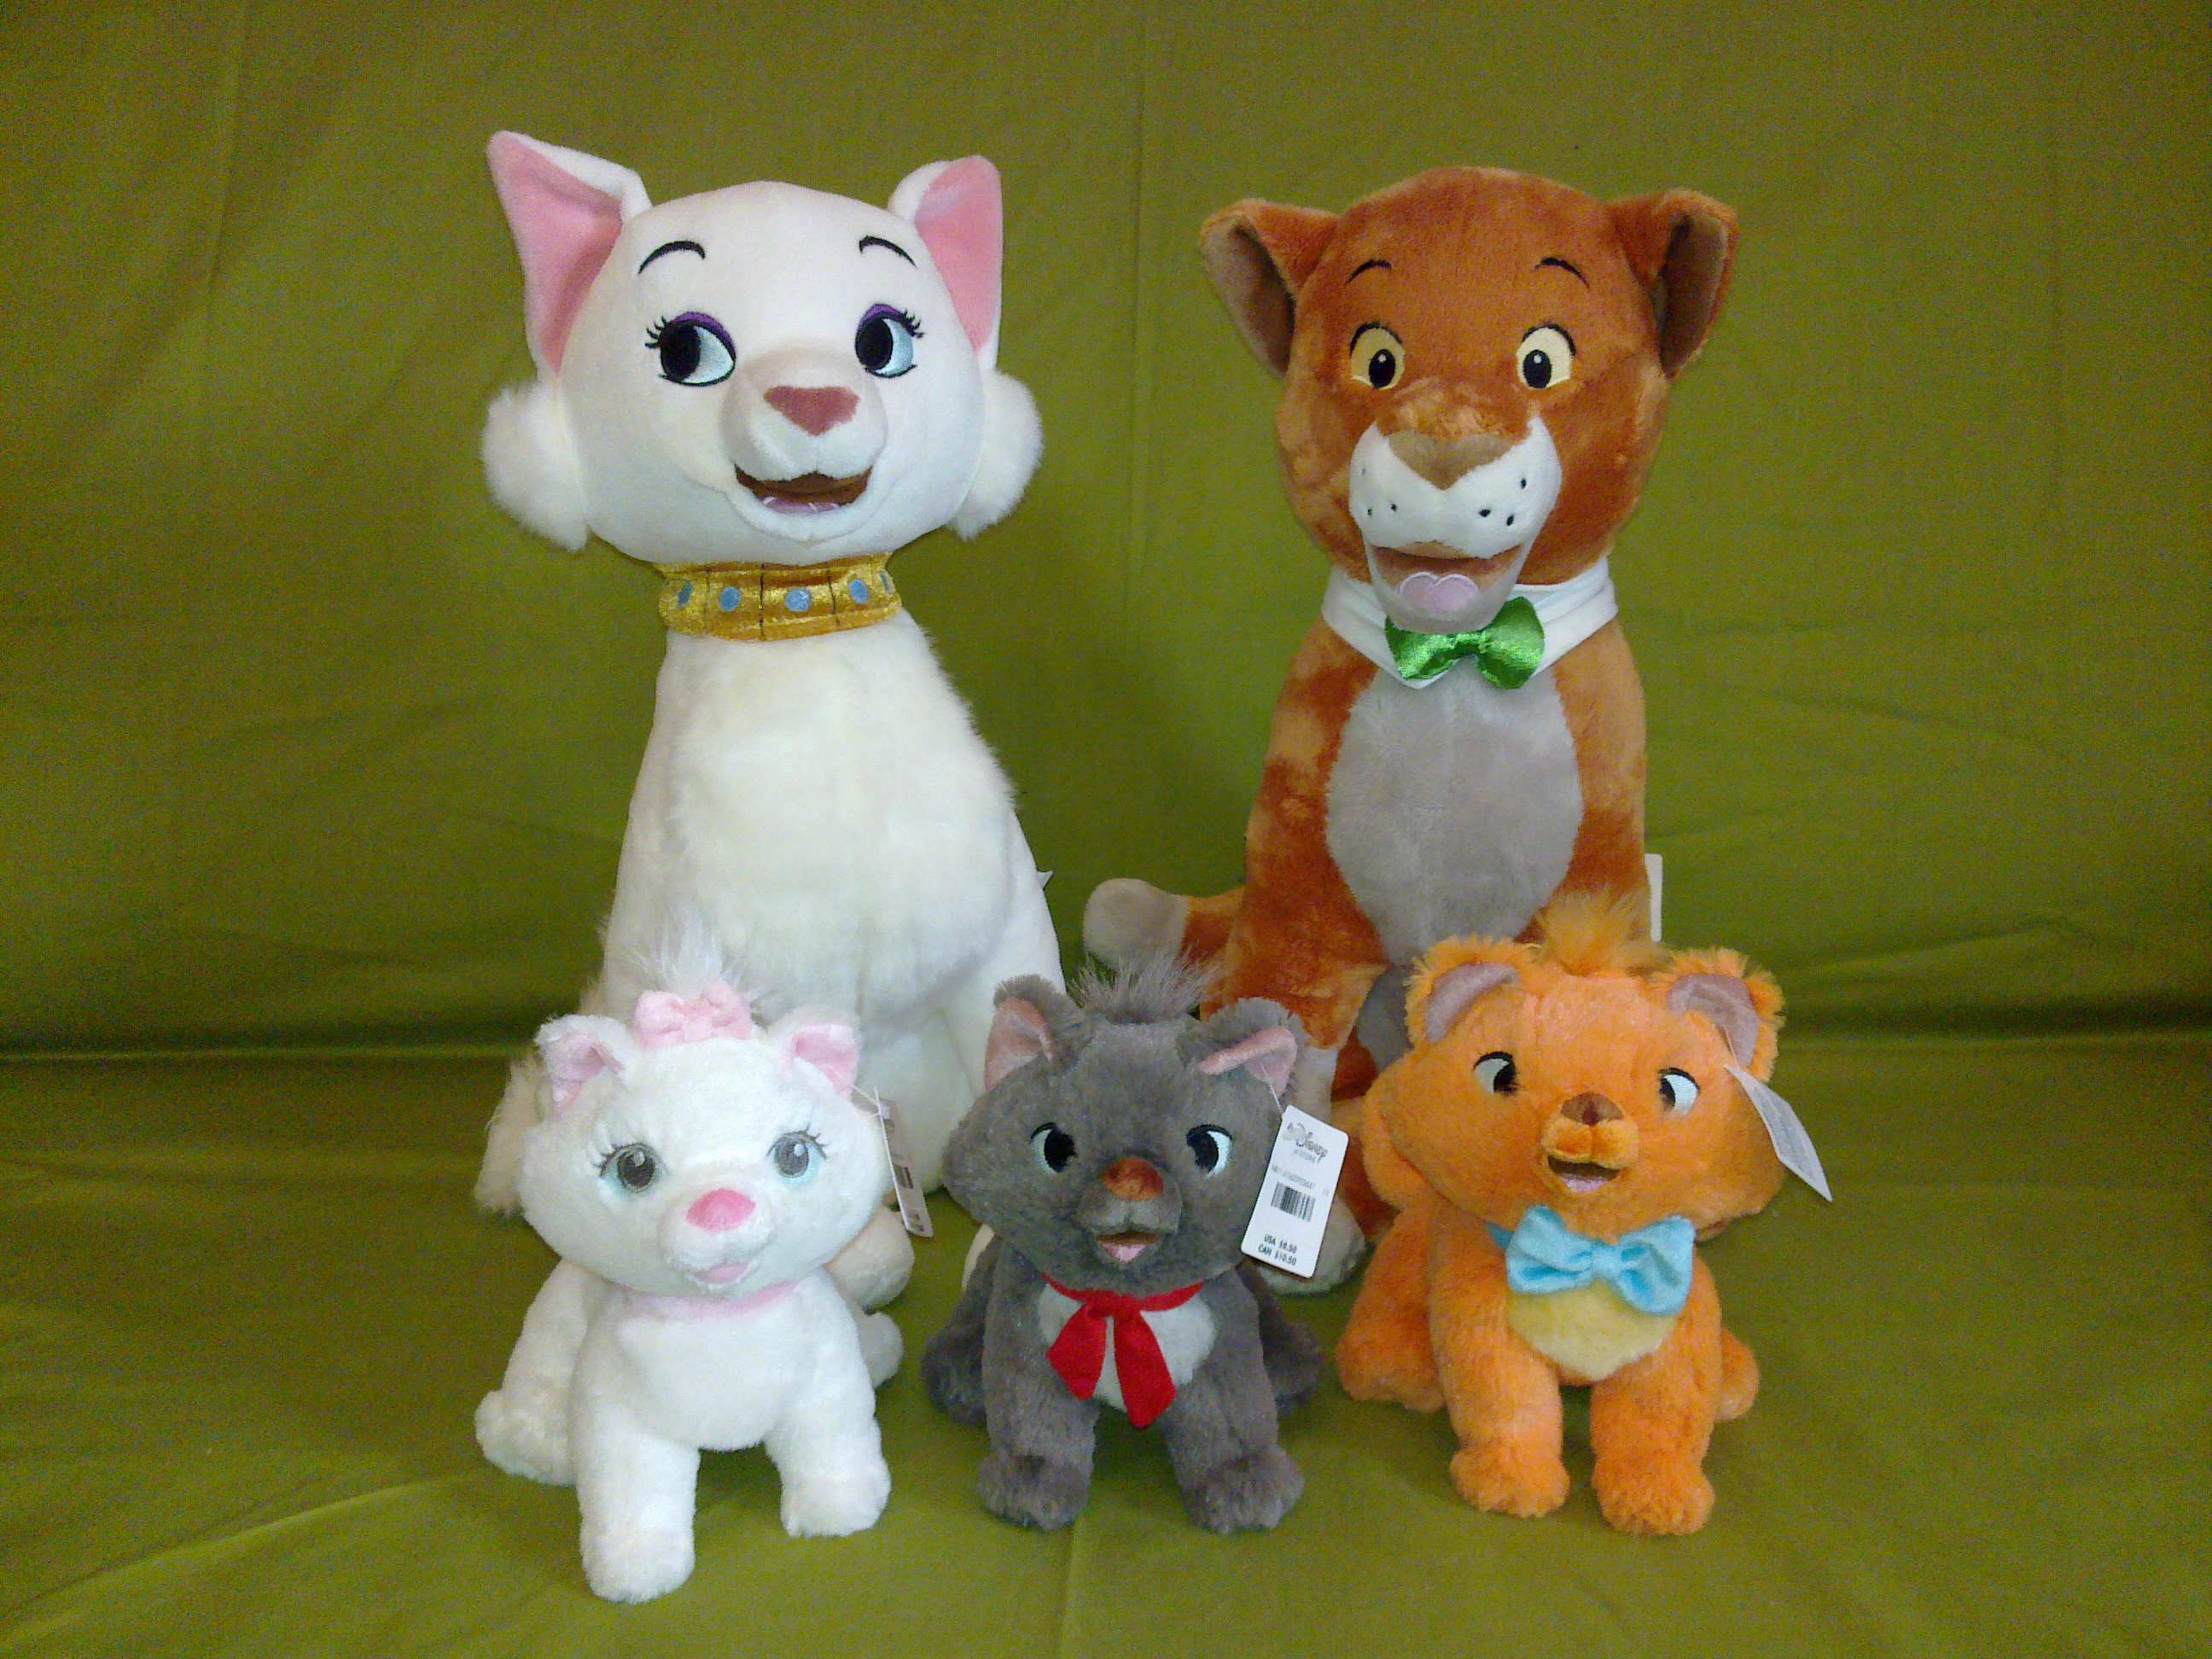 Walt Disney Disneyana antique toy Collectibles for sale.